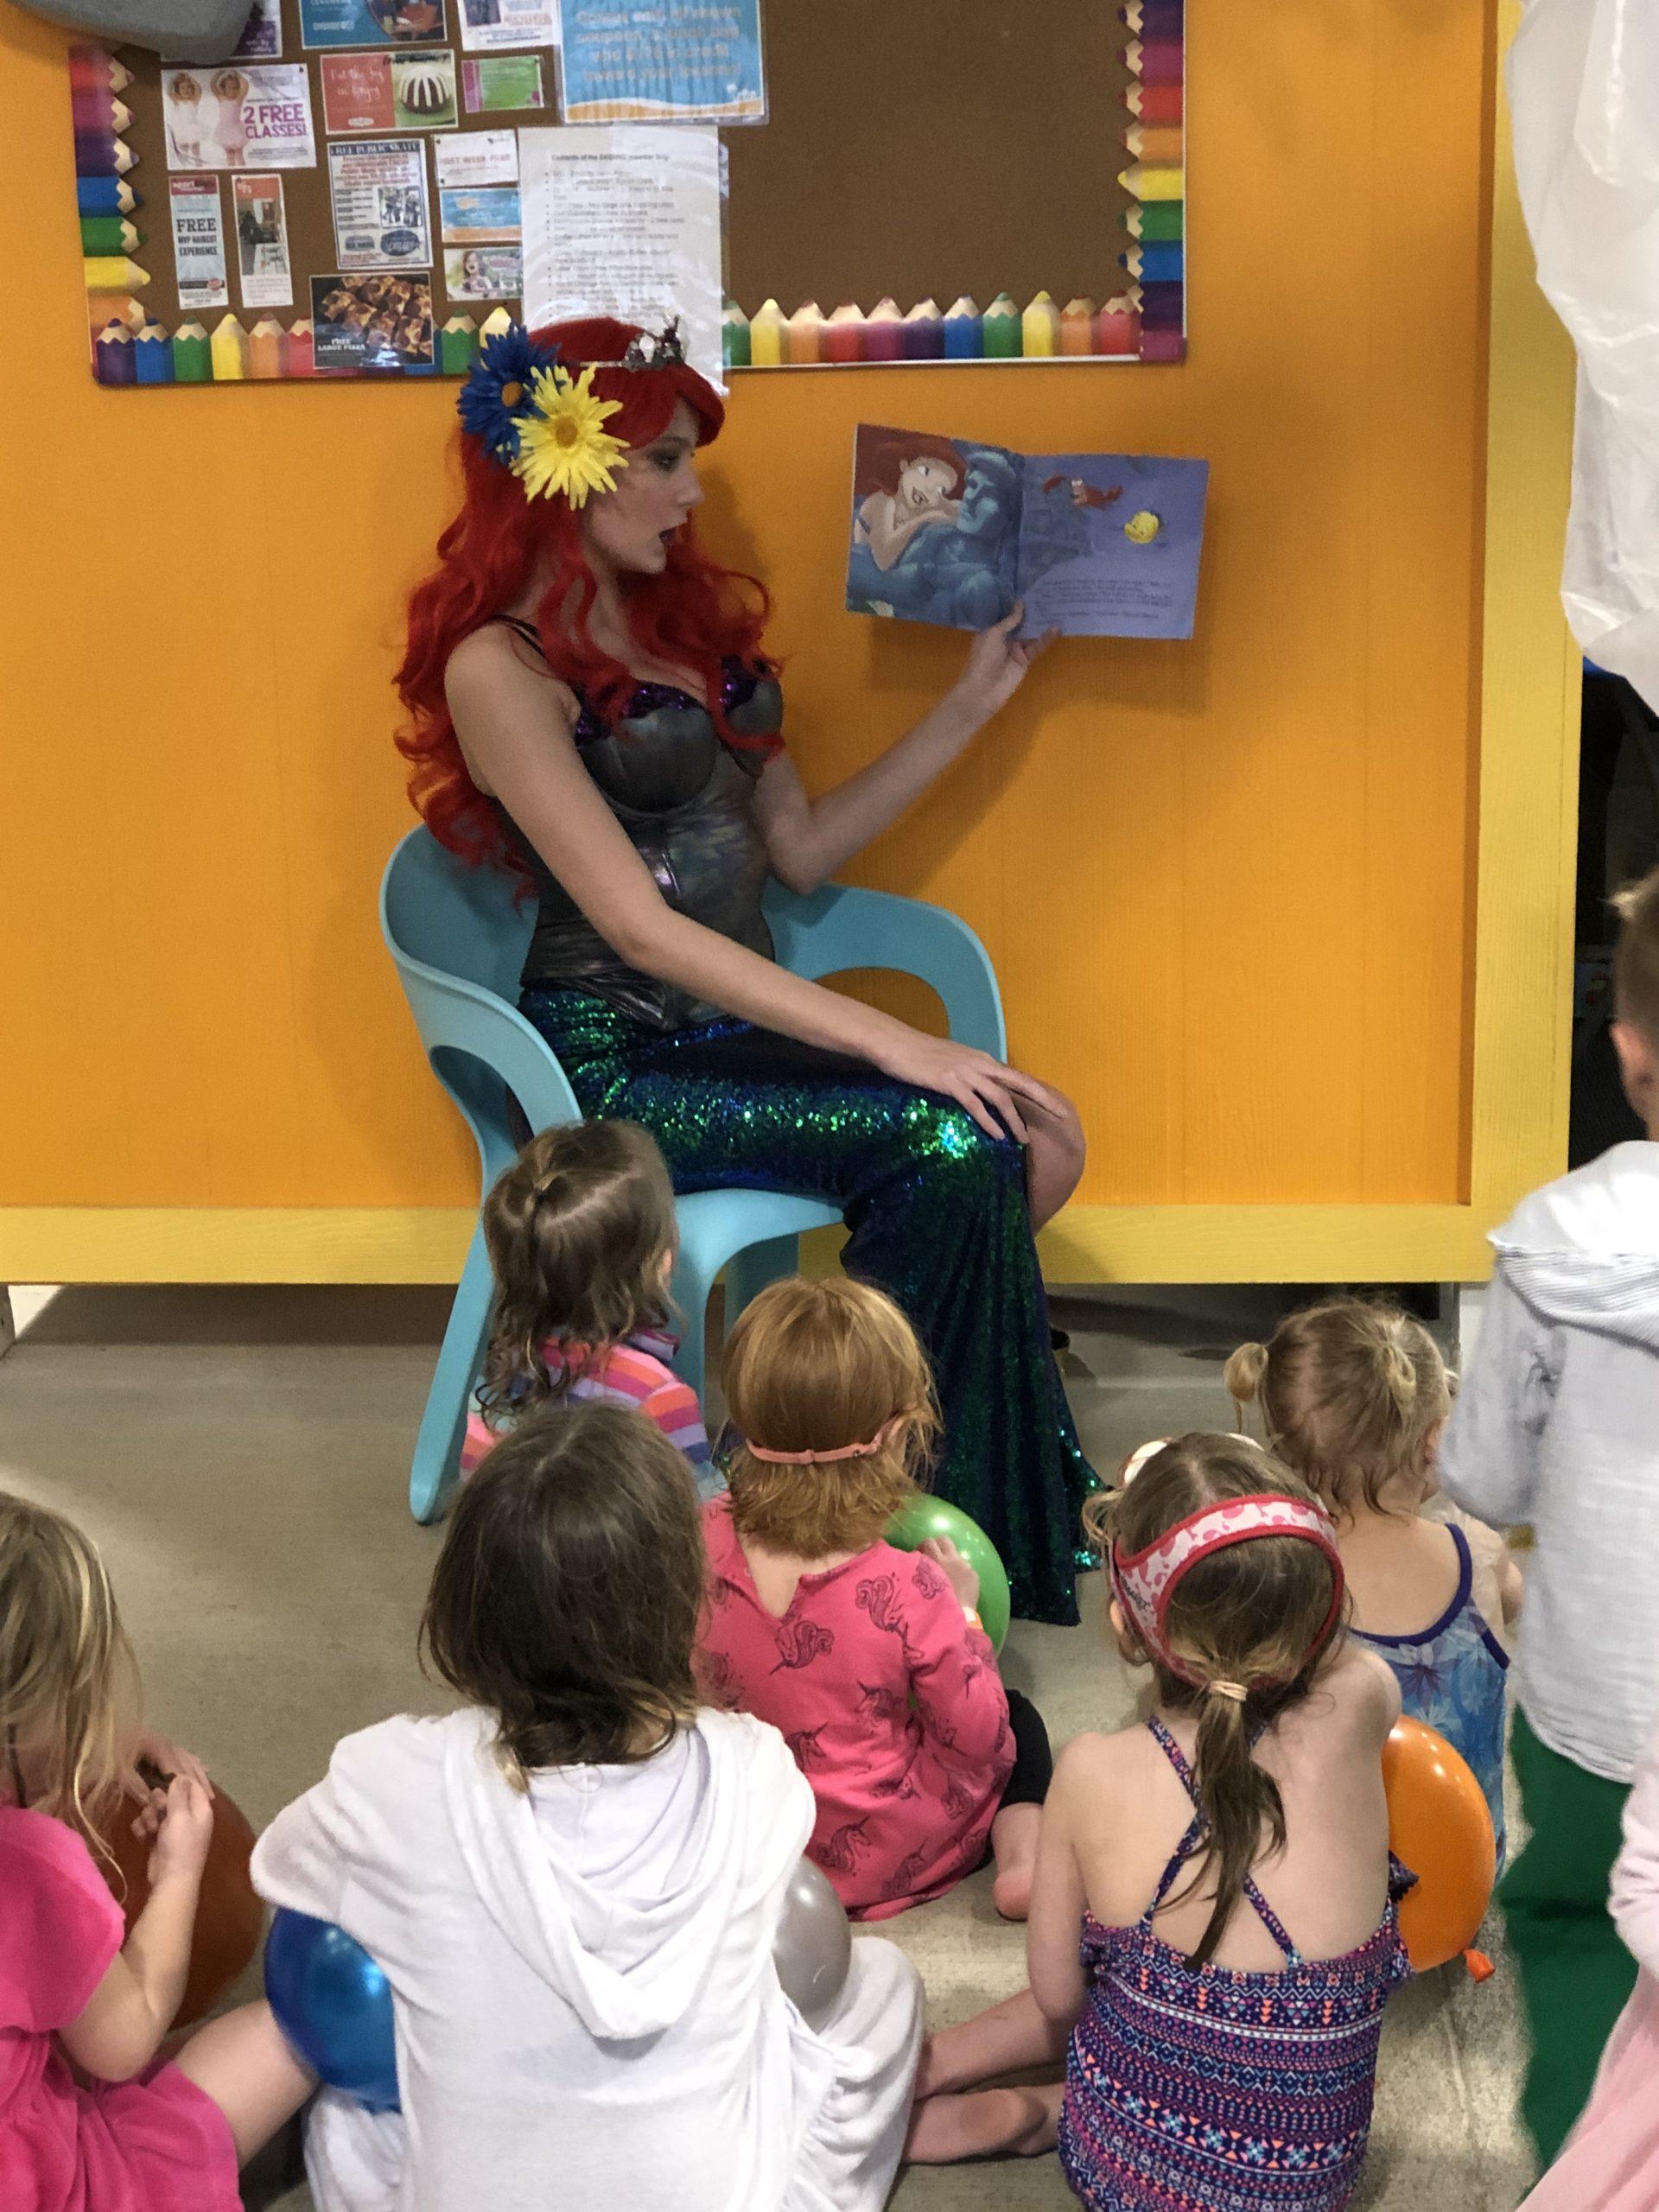 Little Mermaid story